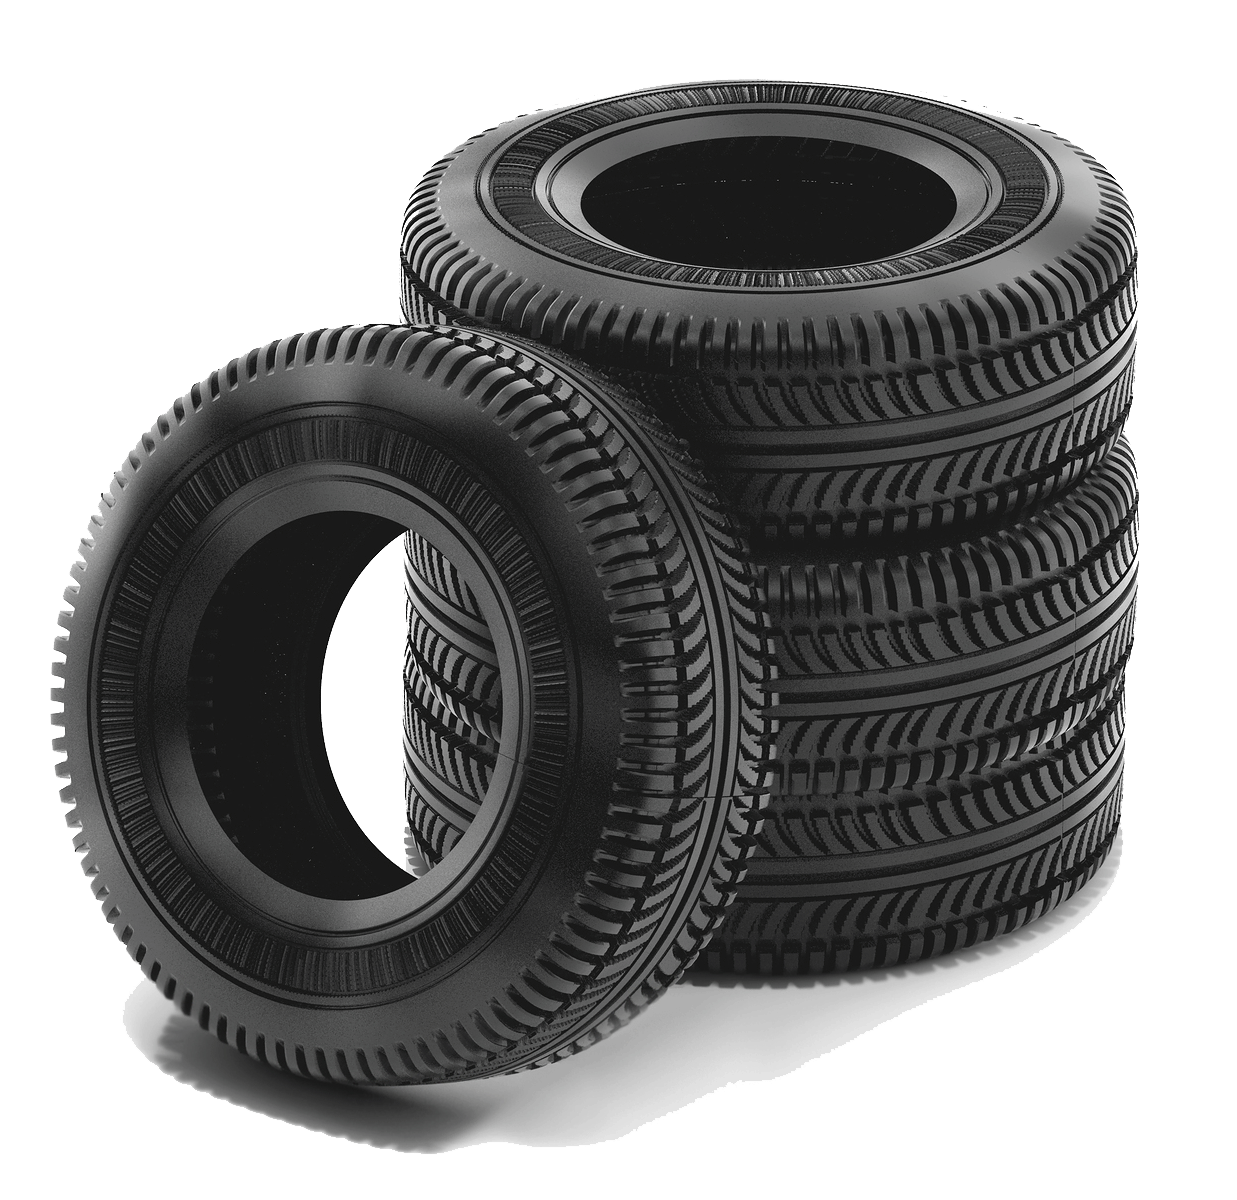 Wheel clipart rubber tire. Transparent wheels mathszone co